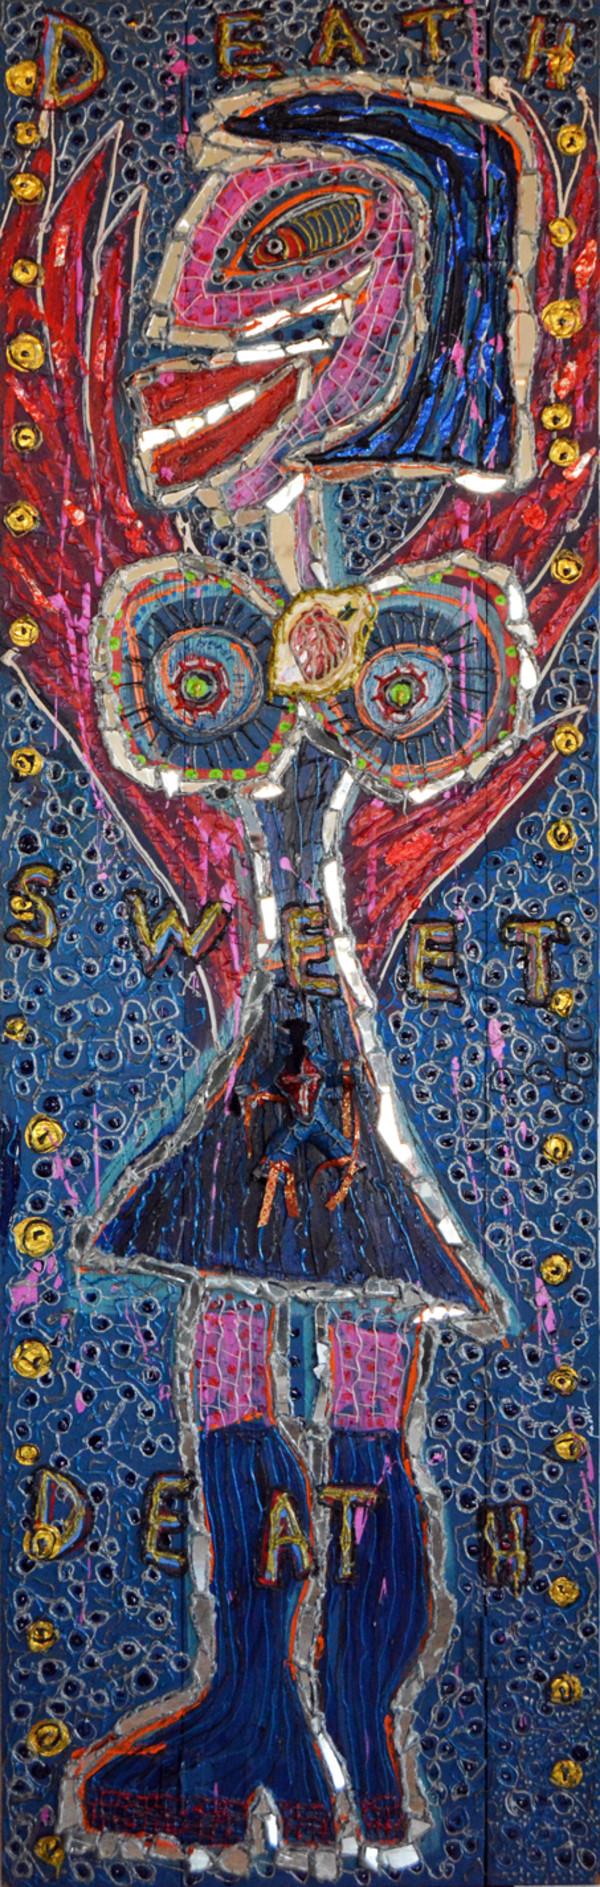 Death Angel-Death Sweet Death by Dougie Padilla